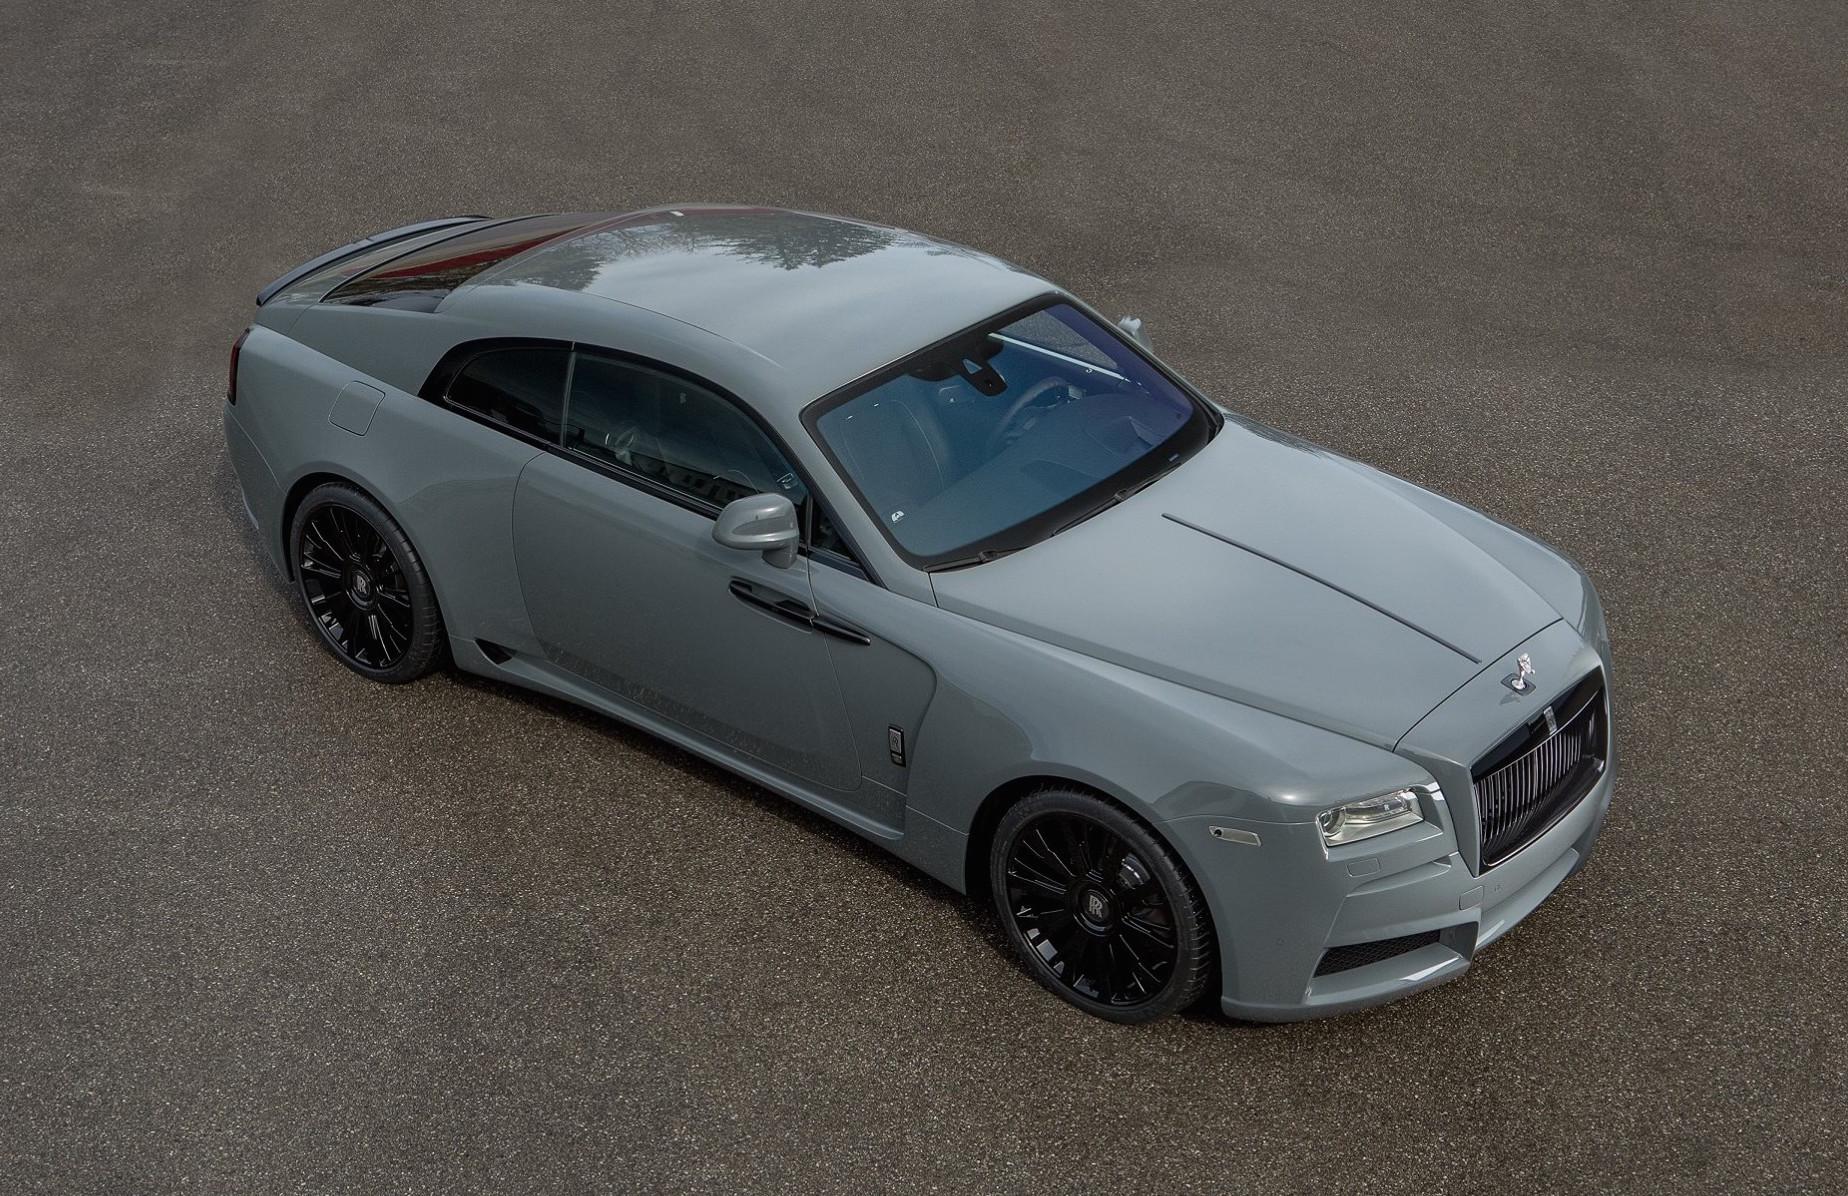 Rolls Royce Wraith Black Badge >> Rolls-Royce Wraith Archives | PerformanceDrive